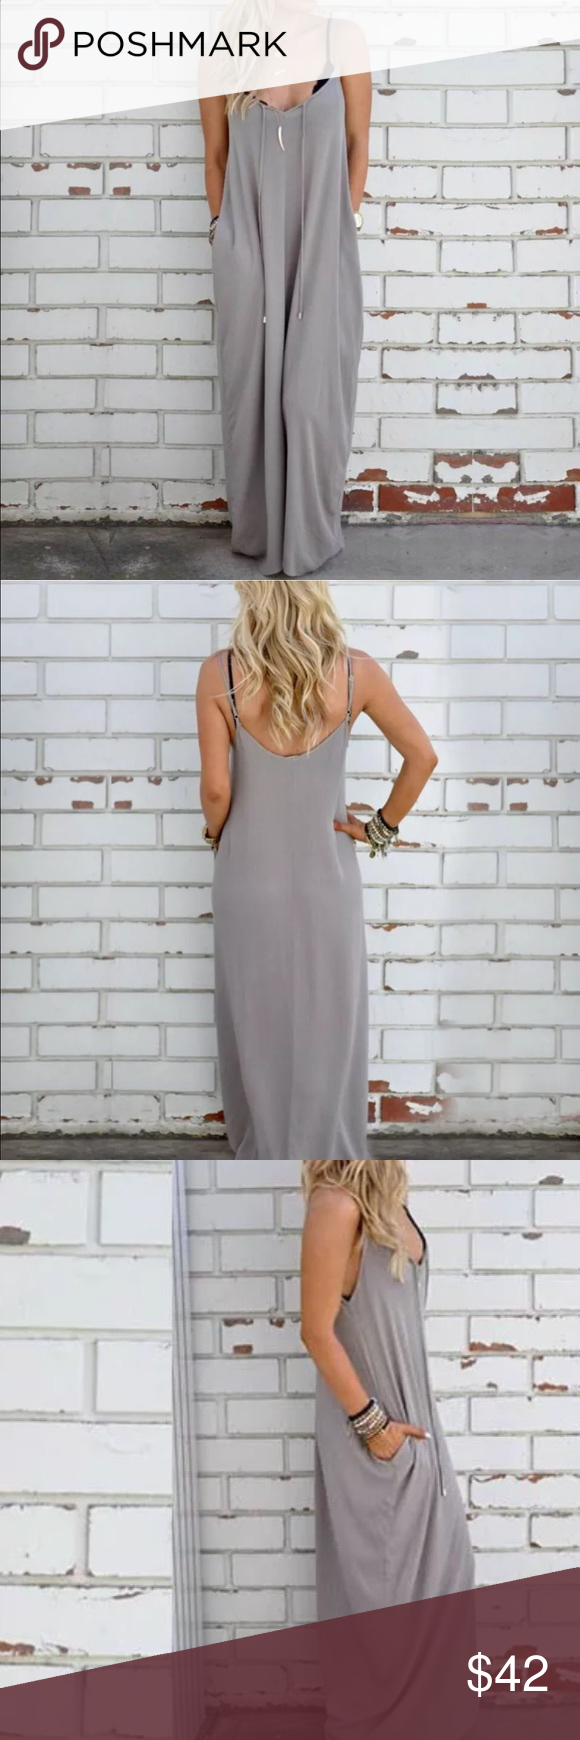 Oversized maxi summer dress boutique pinterest dresses dresses